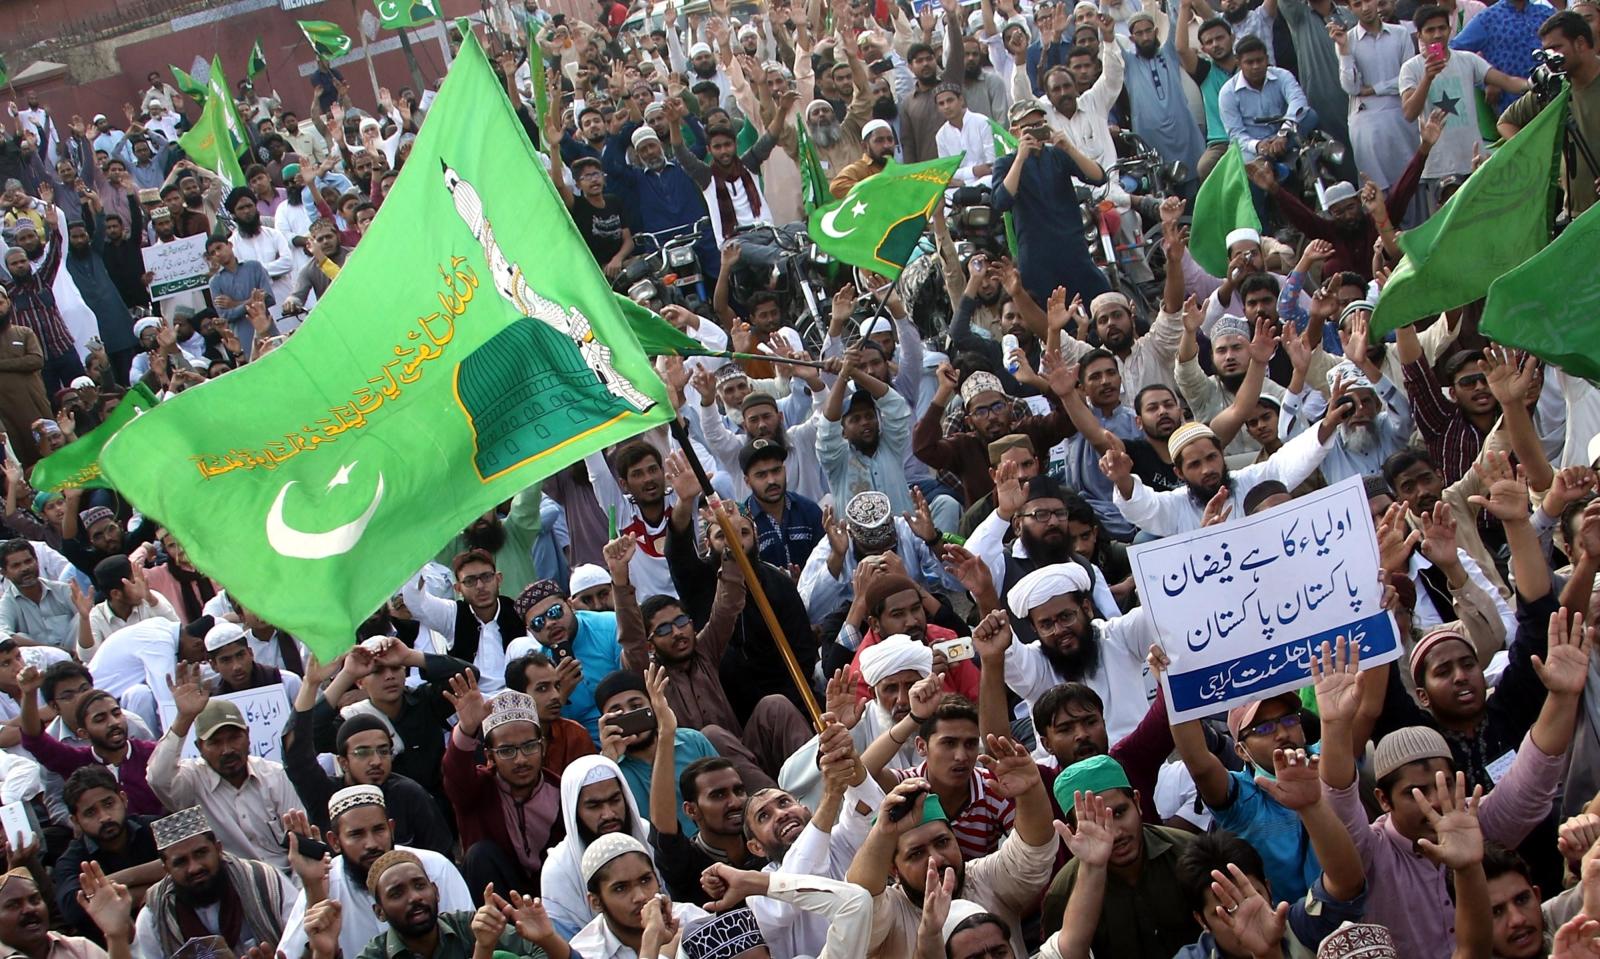 Zwolennicy partii Jamaat Ahle Sunnat w czasie manifestacji.